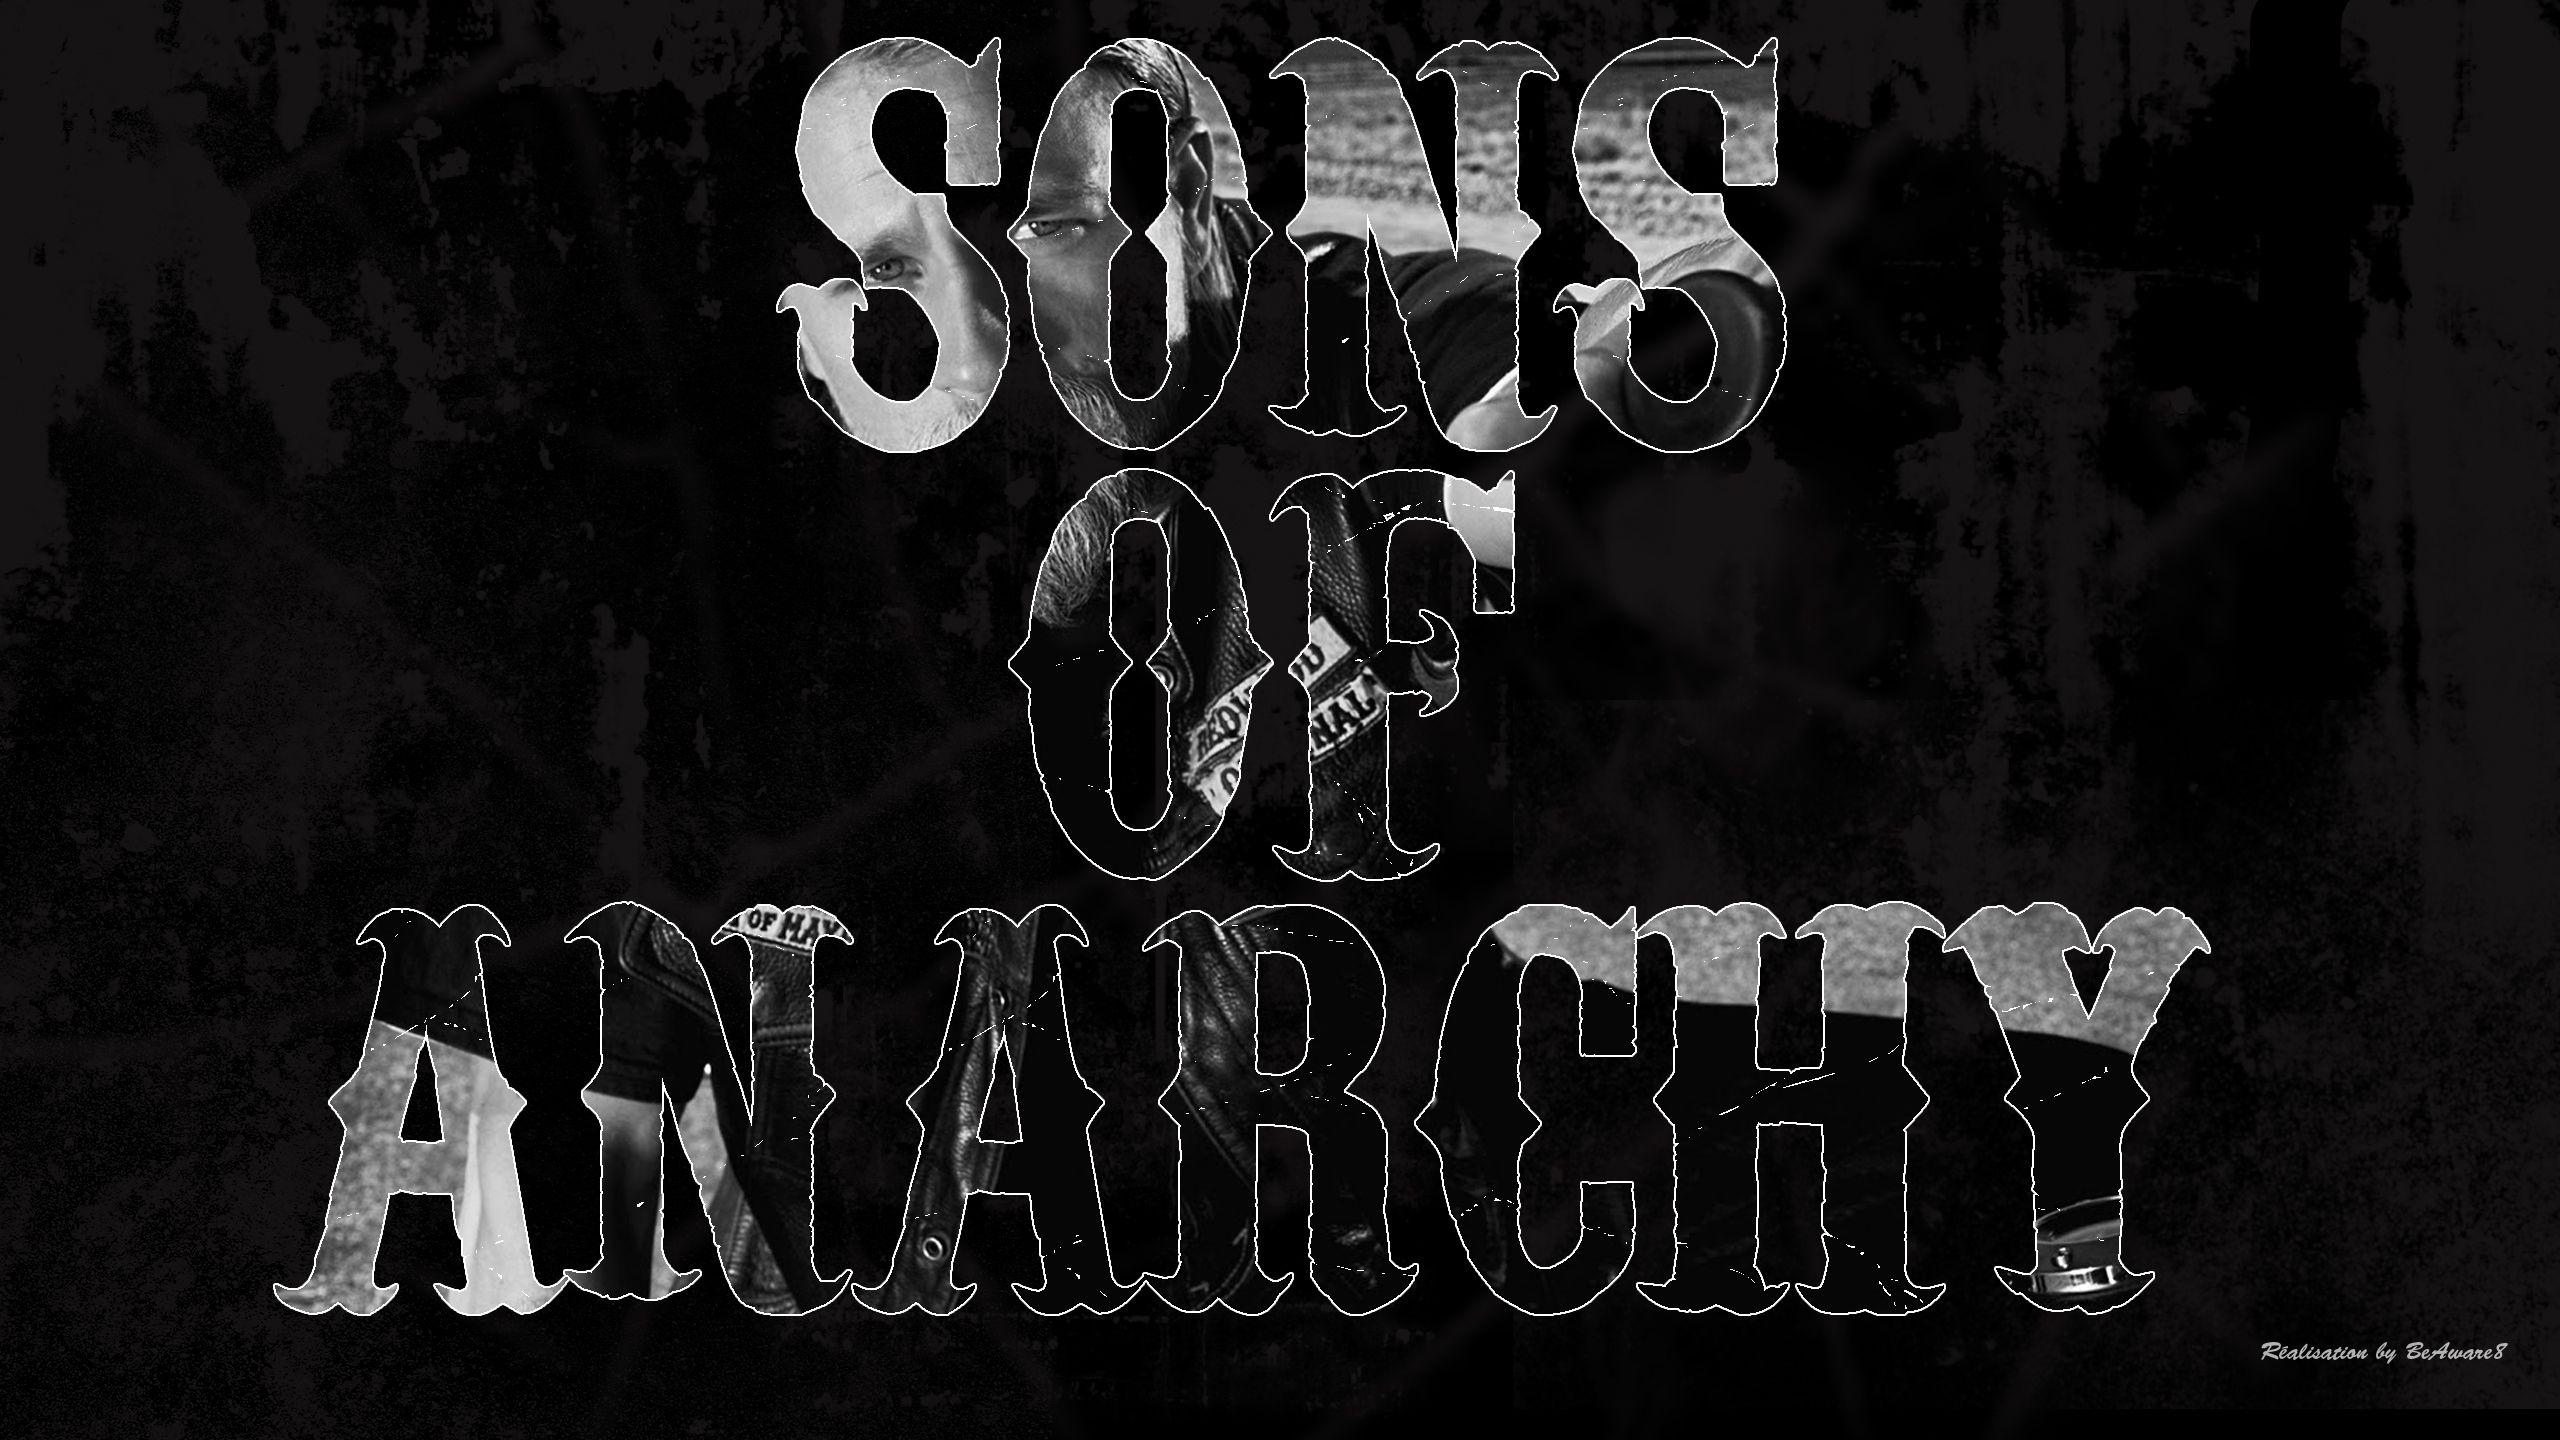 Sons Of Anarchy Description Download Desktop Wallpaper Of Sons